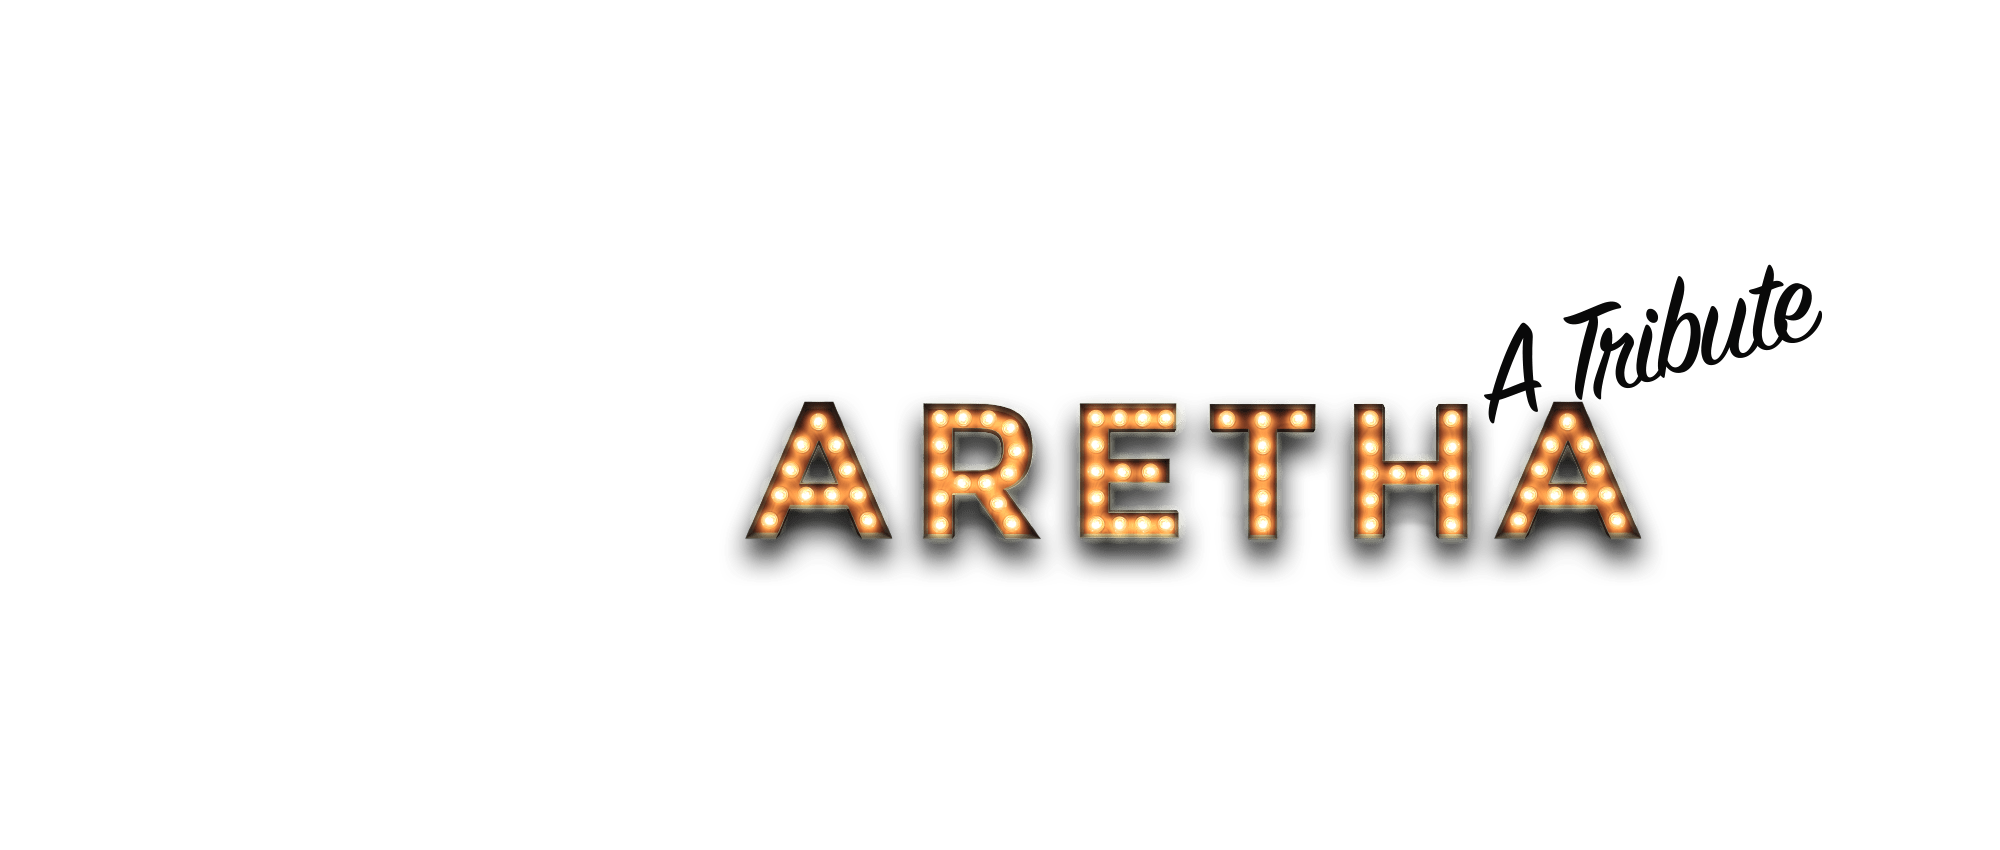 Aretha: A Tribute